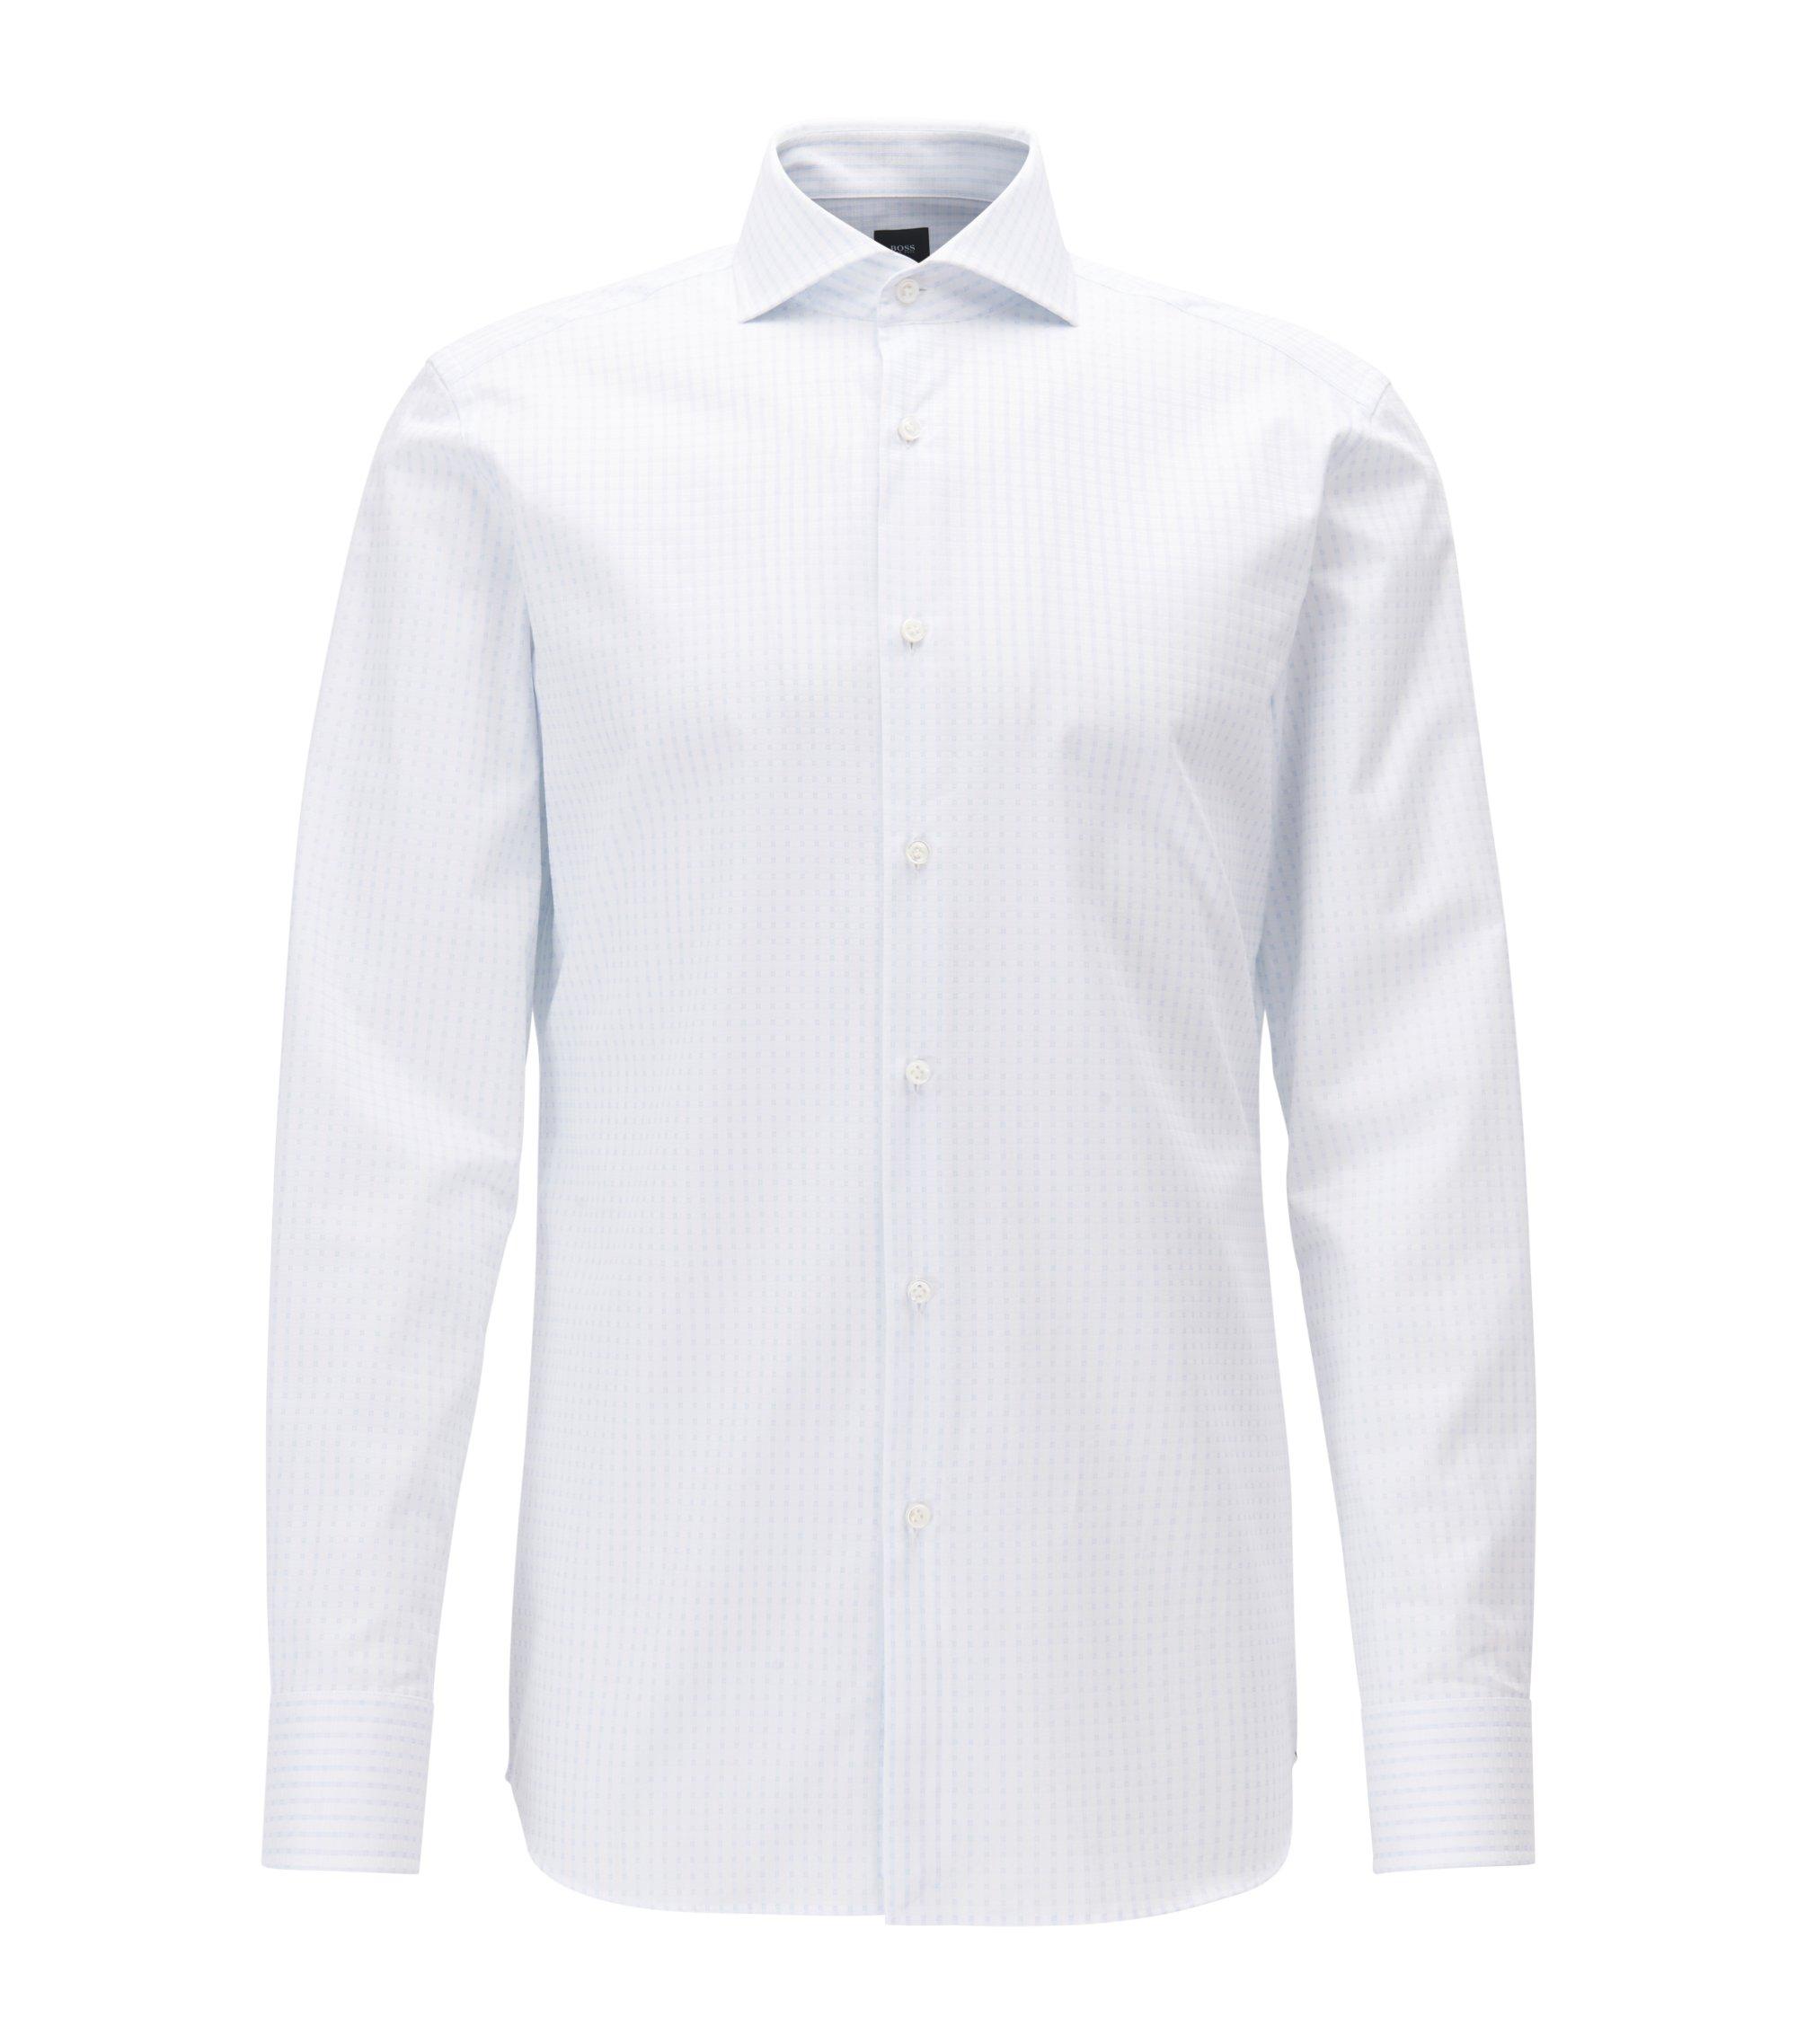 Tonal Check Cotton Dress Shirt, Slim Fit | T-Christo, Light Blue